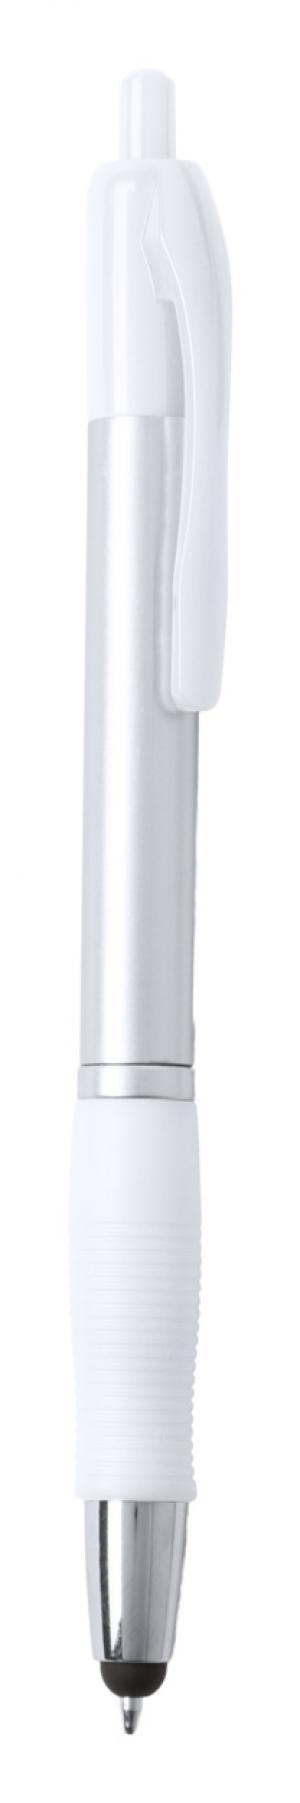 Verslo dovanos Clurk (touch ballpoint pen)